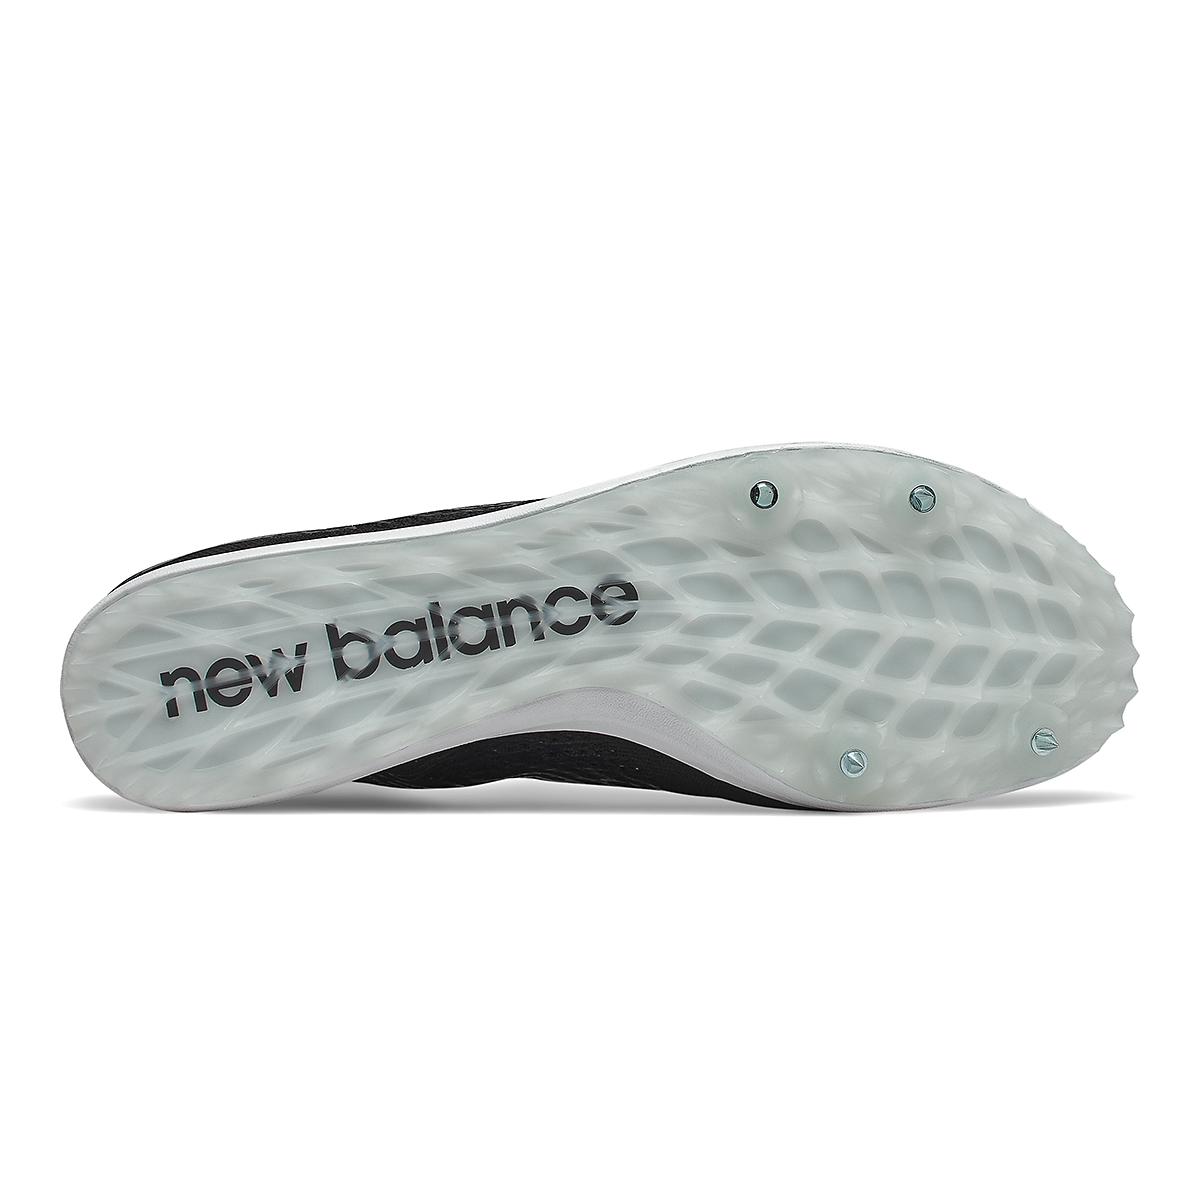 Men's New Balance LD5Kv8 Track Spikes - Color: Black/White - Size: 8 - Width: Regular, Black/White, large, image 4